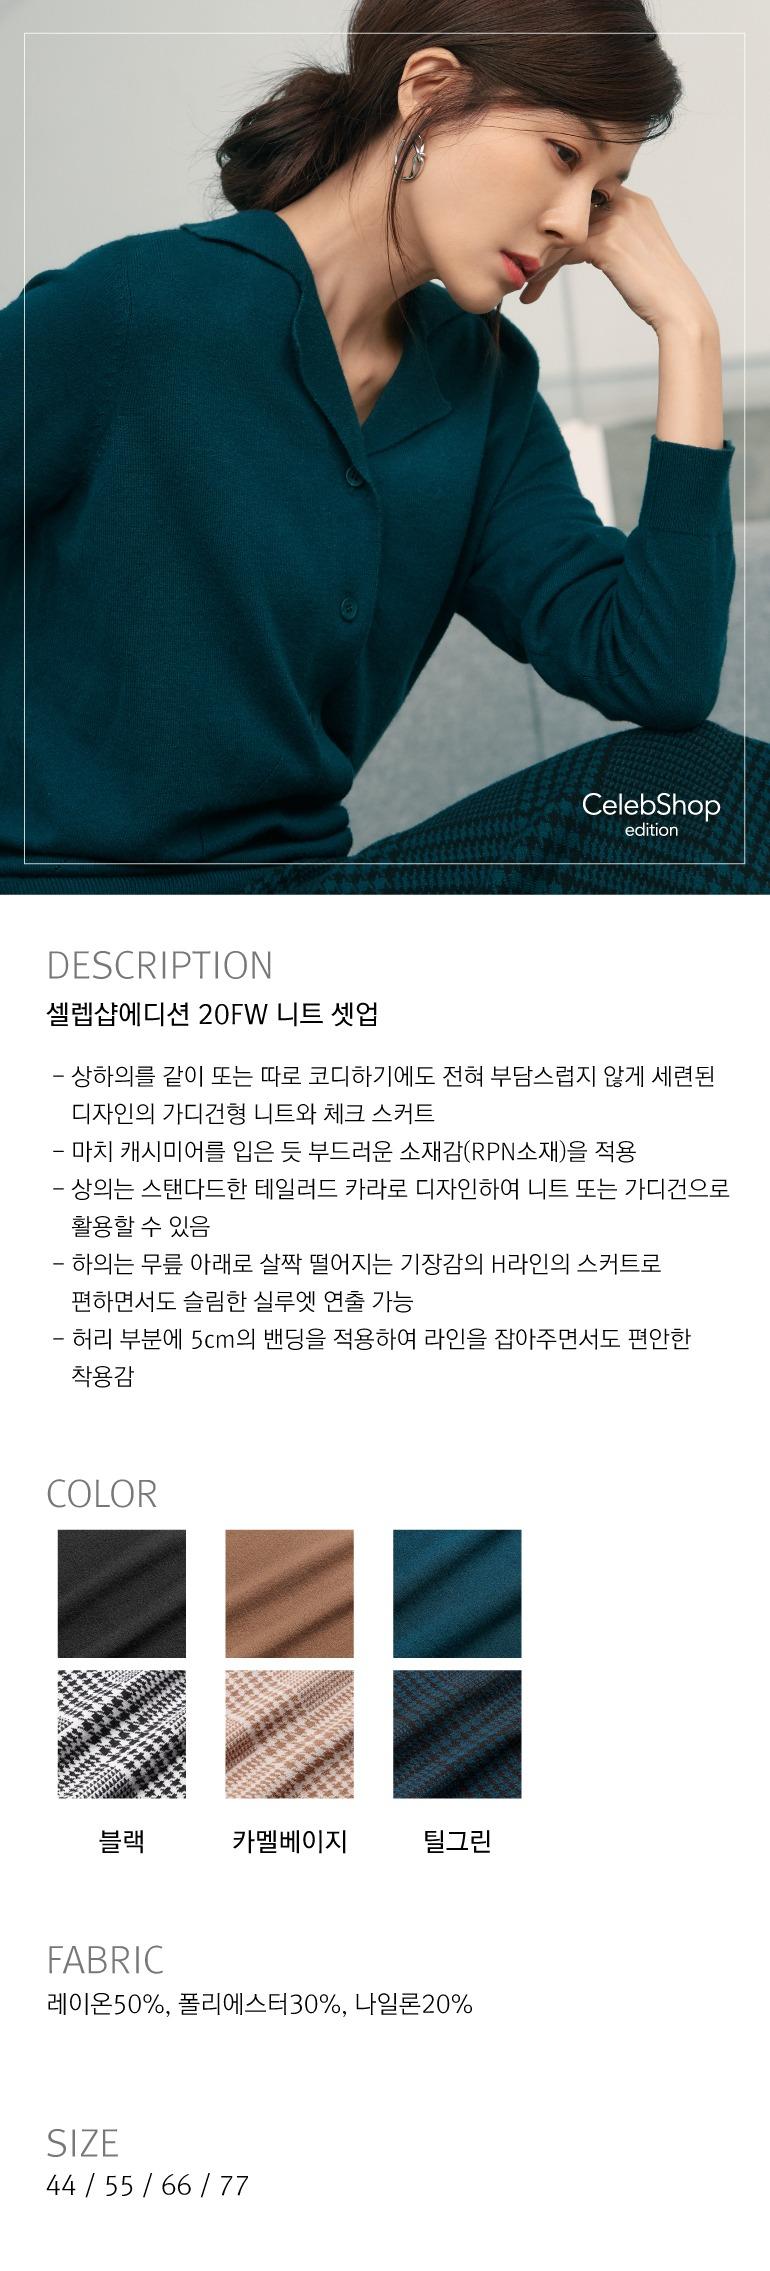 CelebShop edition